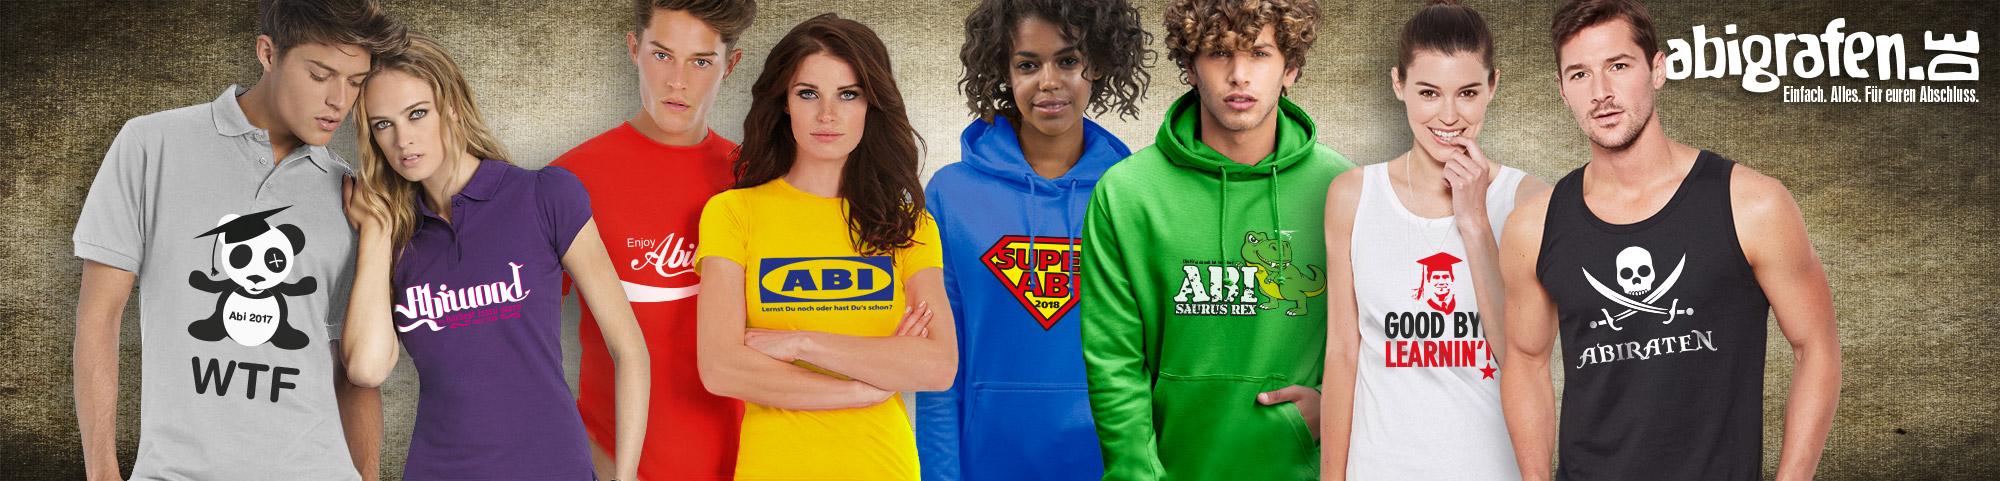 Abi Textilien: Abshirts, Hoodies, Tanktops, Sweatshirts, Pullover bedrucken